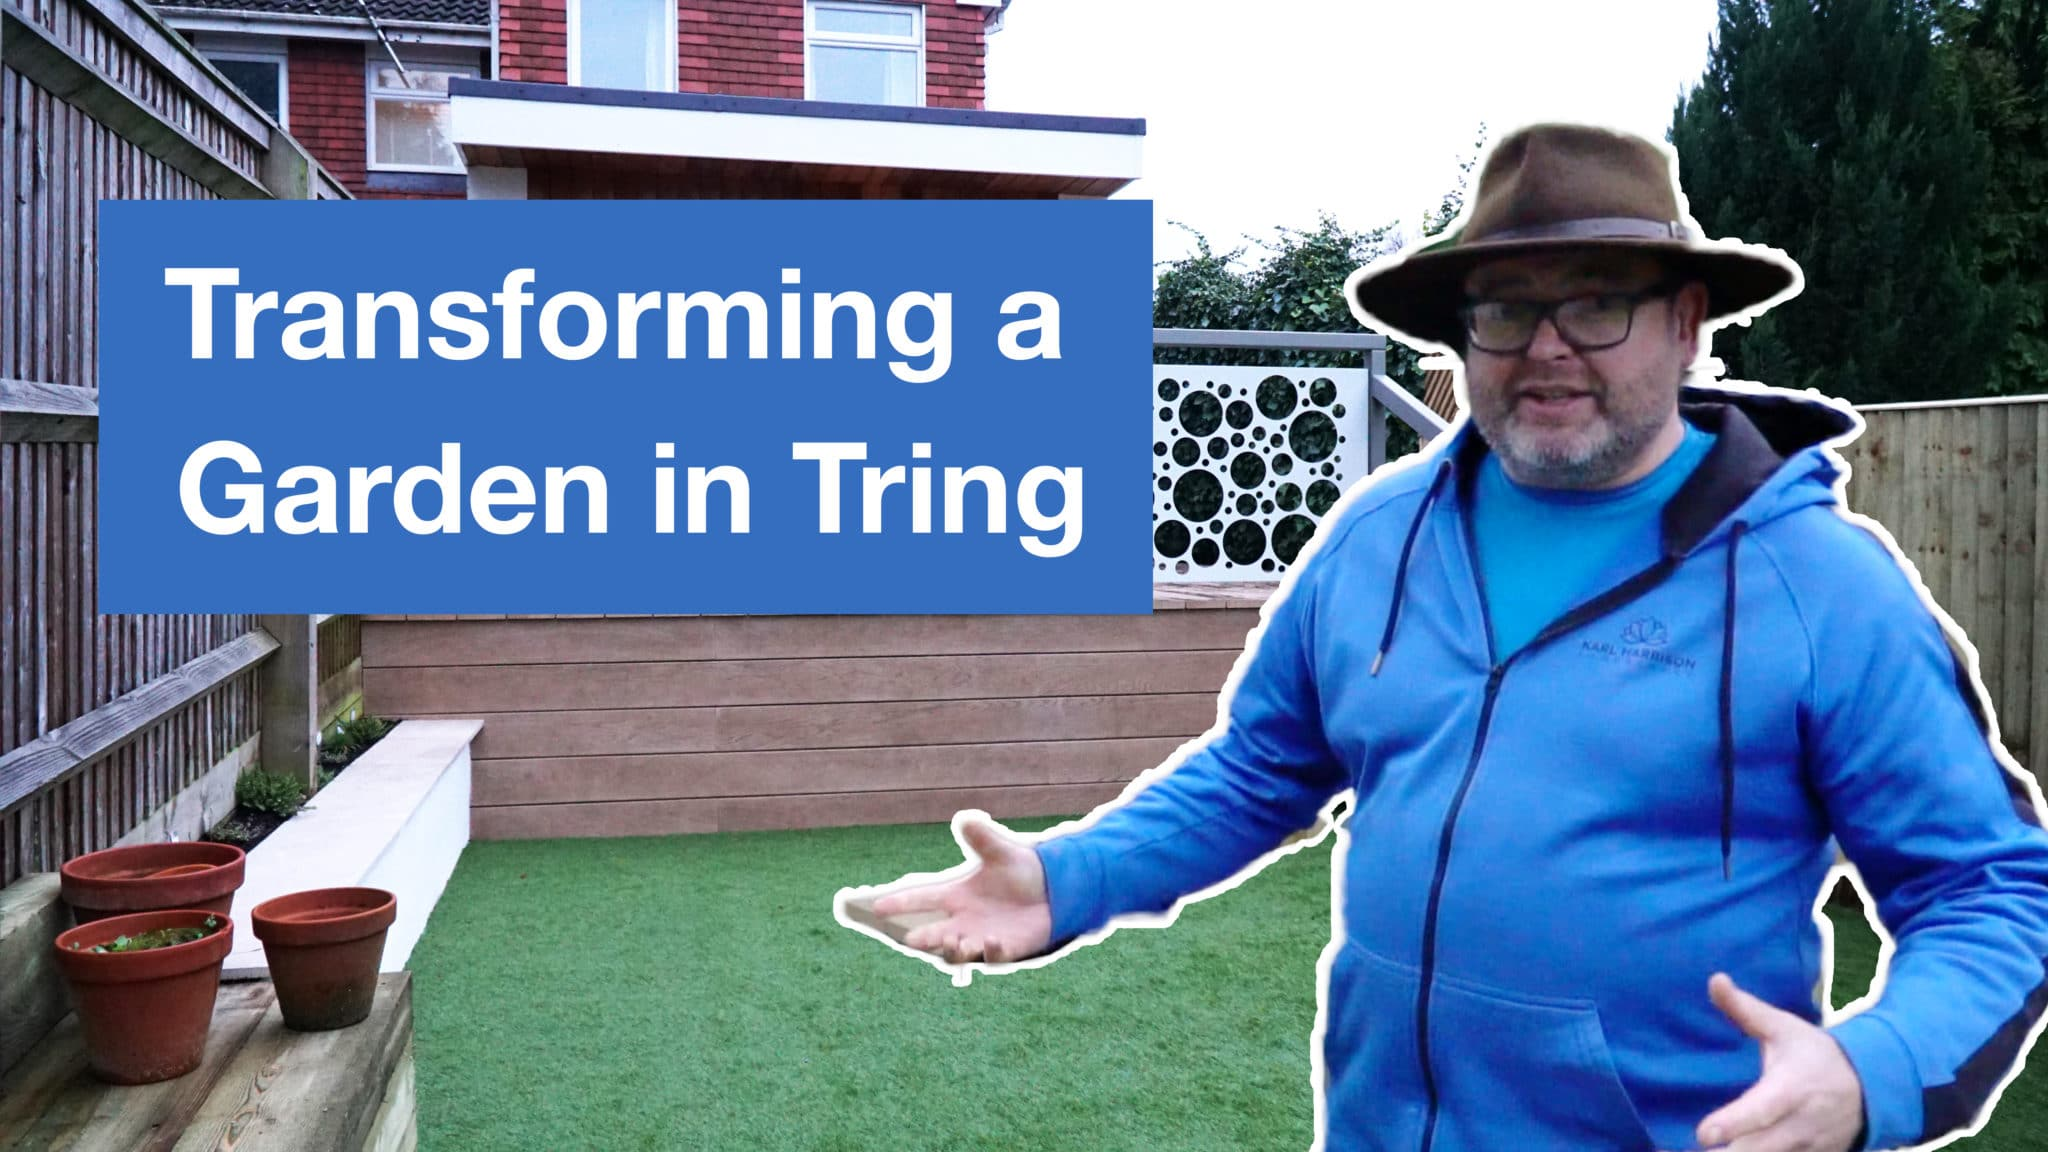 Transforming a garden in Tring